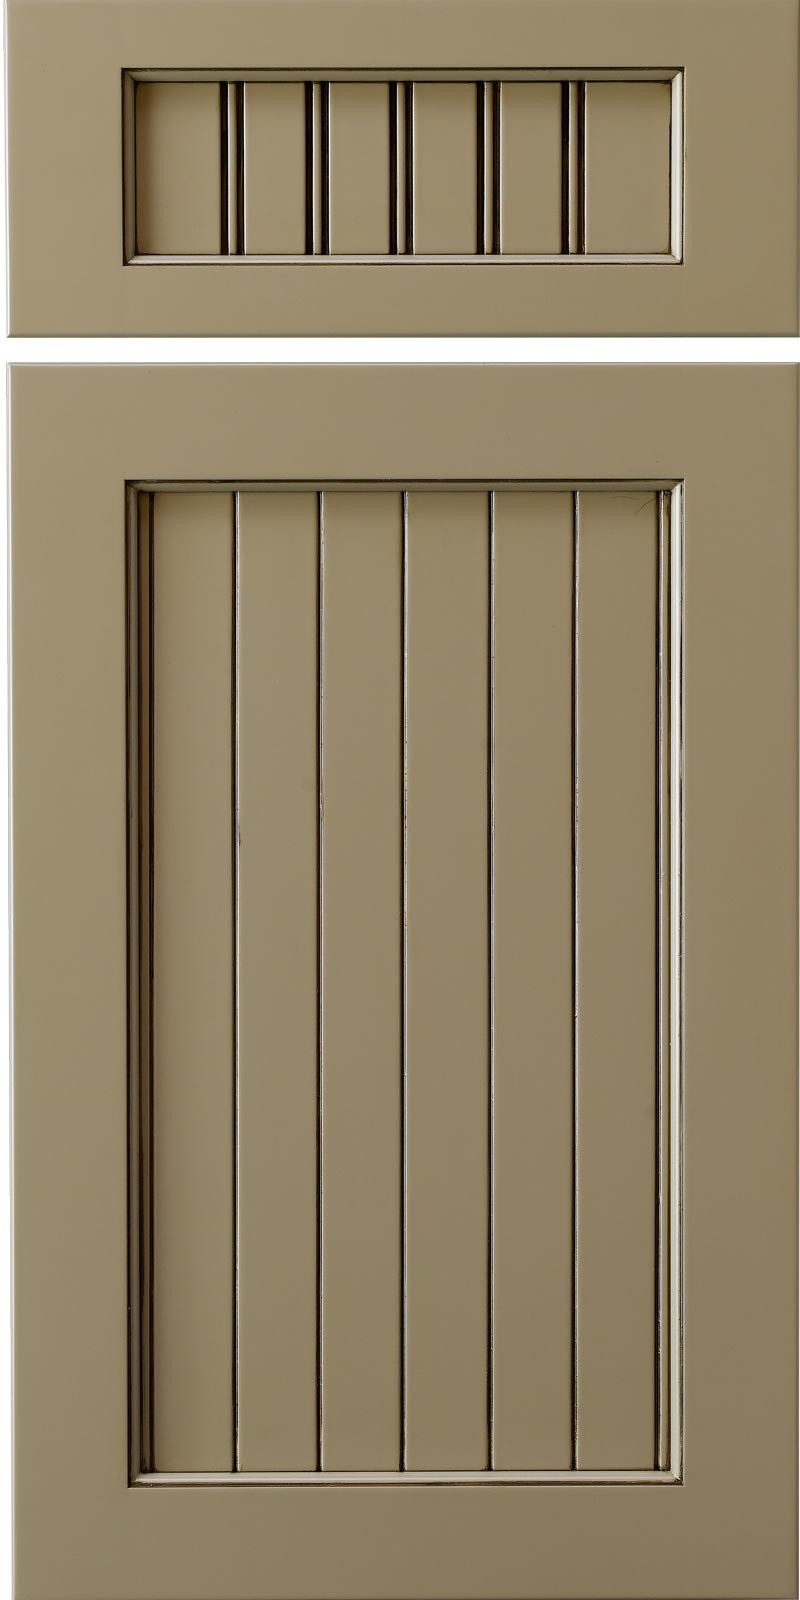 Ardmore medium density fiberboard materials cabinet